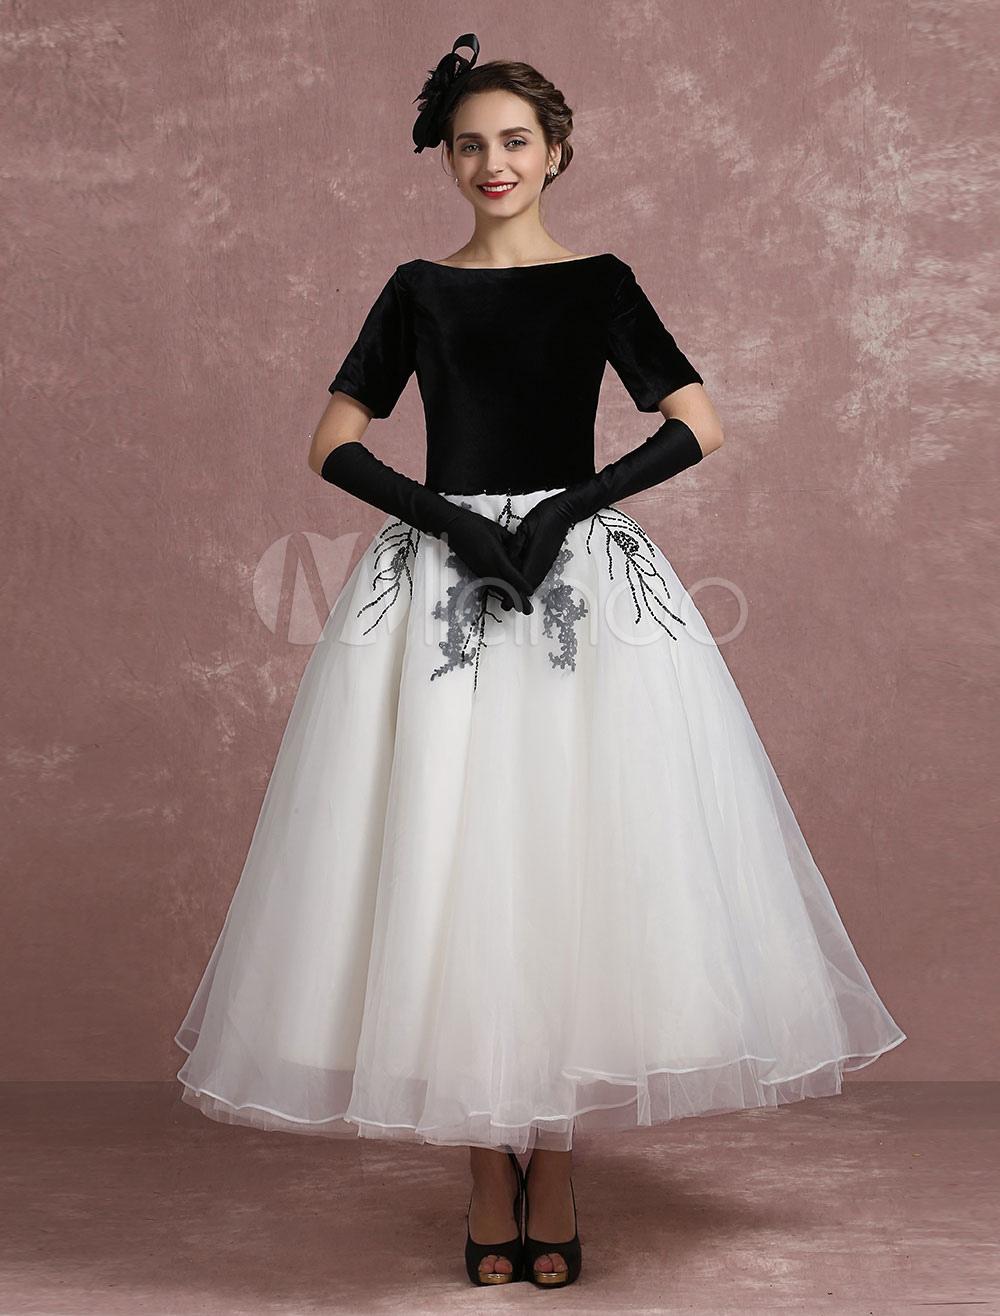 Vintage Cocktail Dress Black Applique Beaded Prom Dress Velvet Bateau Short Sleeve A Line Ankle Length Party Dress Milanoo (Wedding Cocktail Dresses) photo